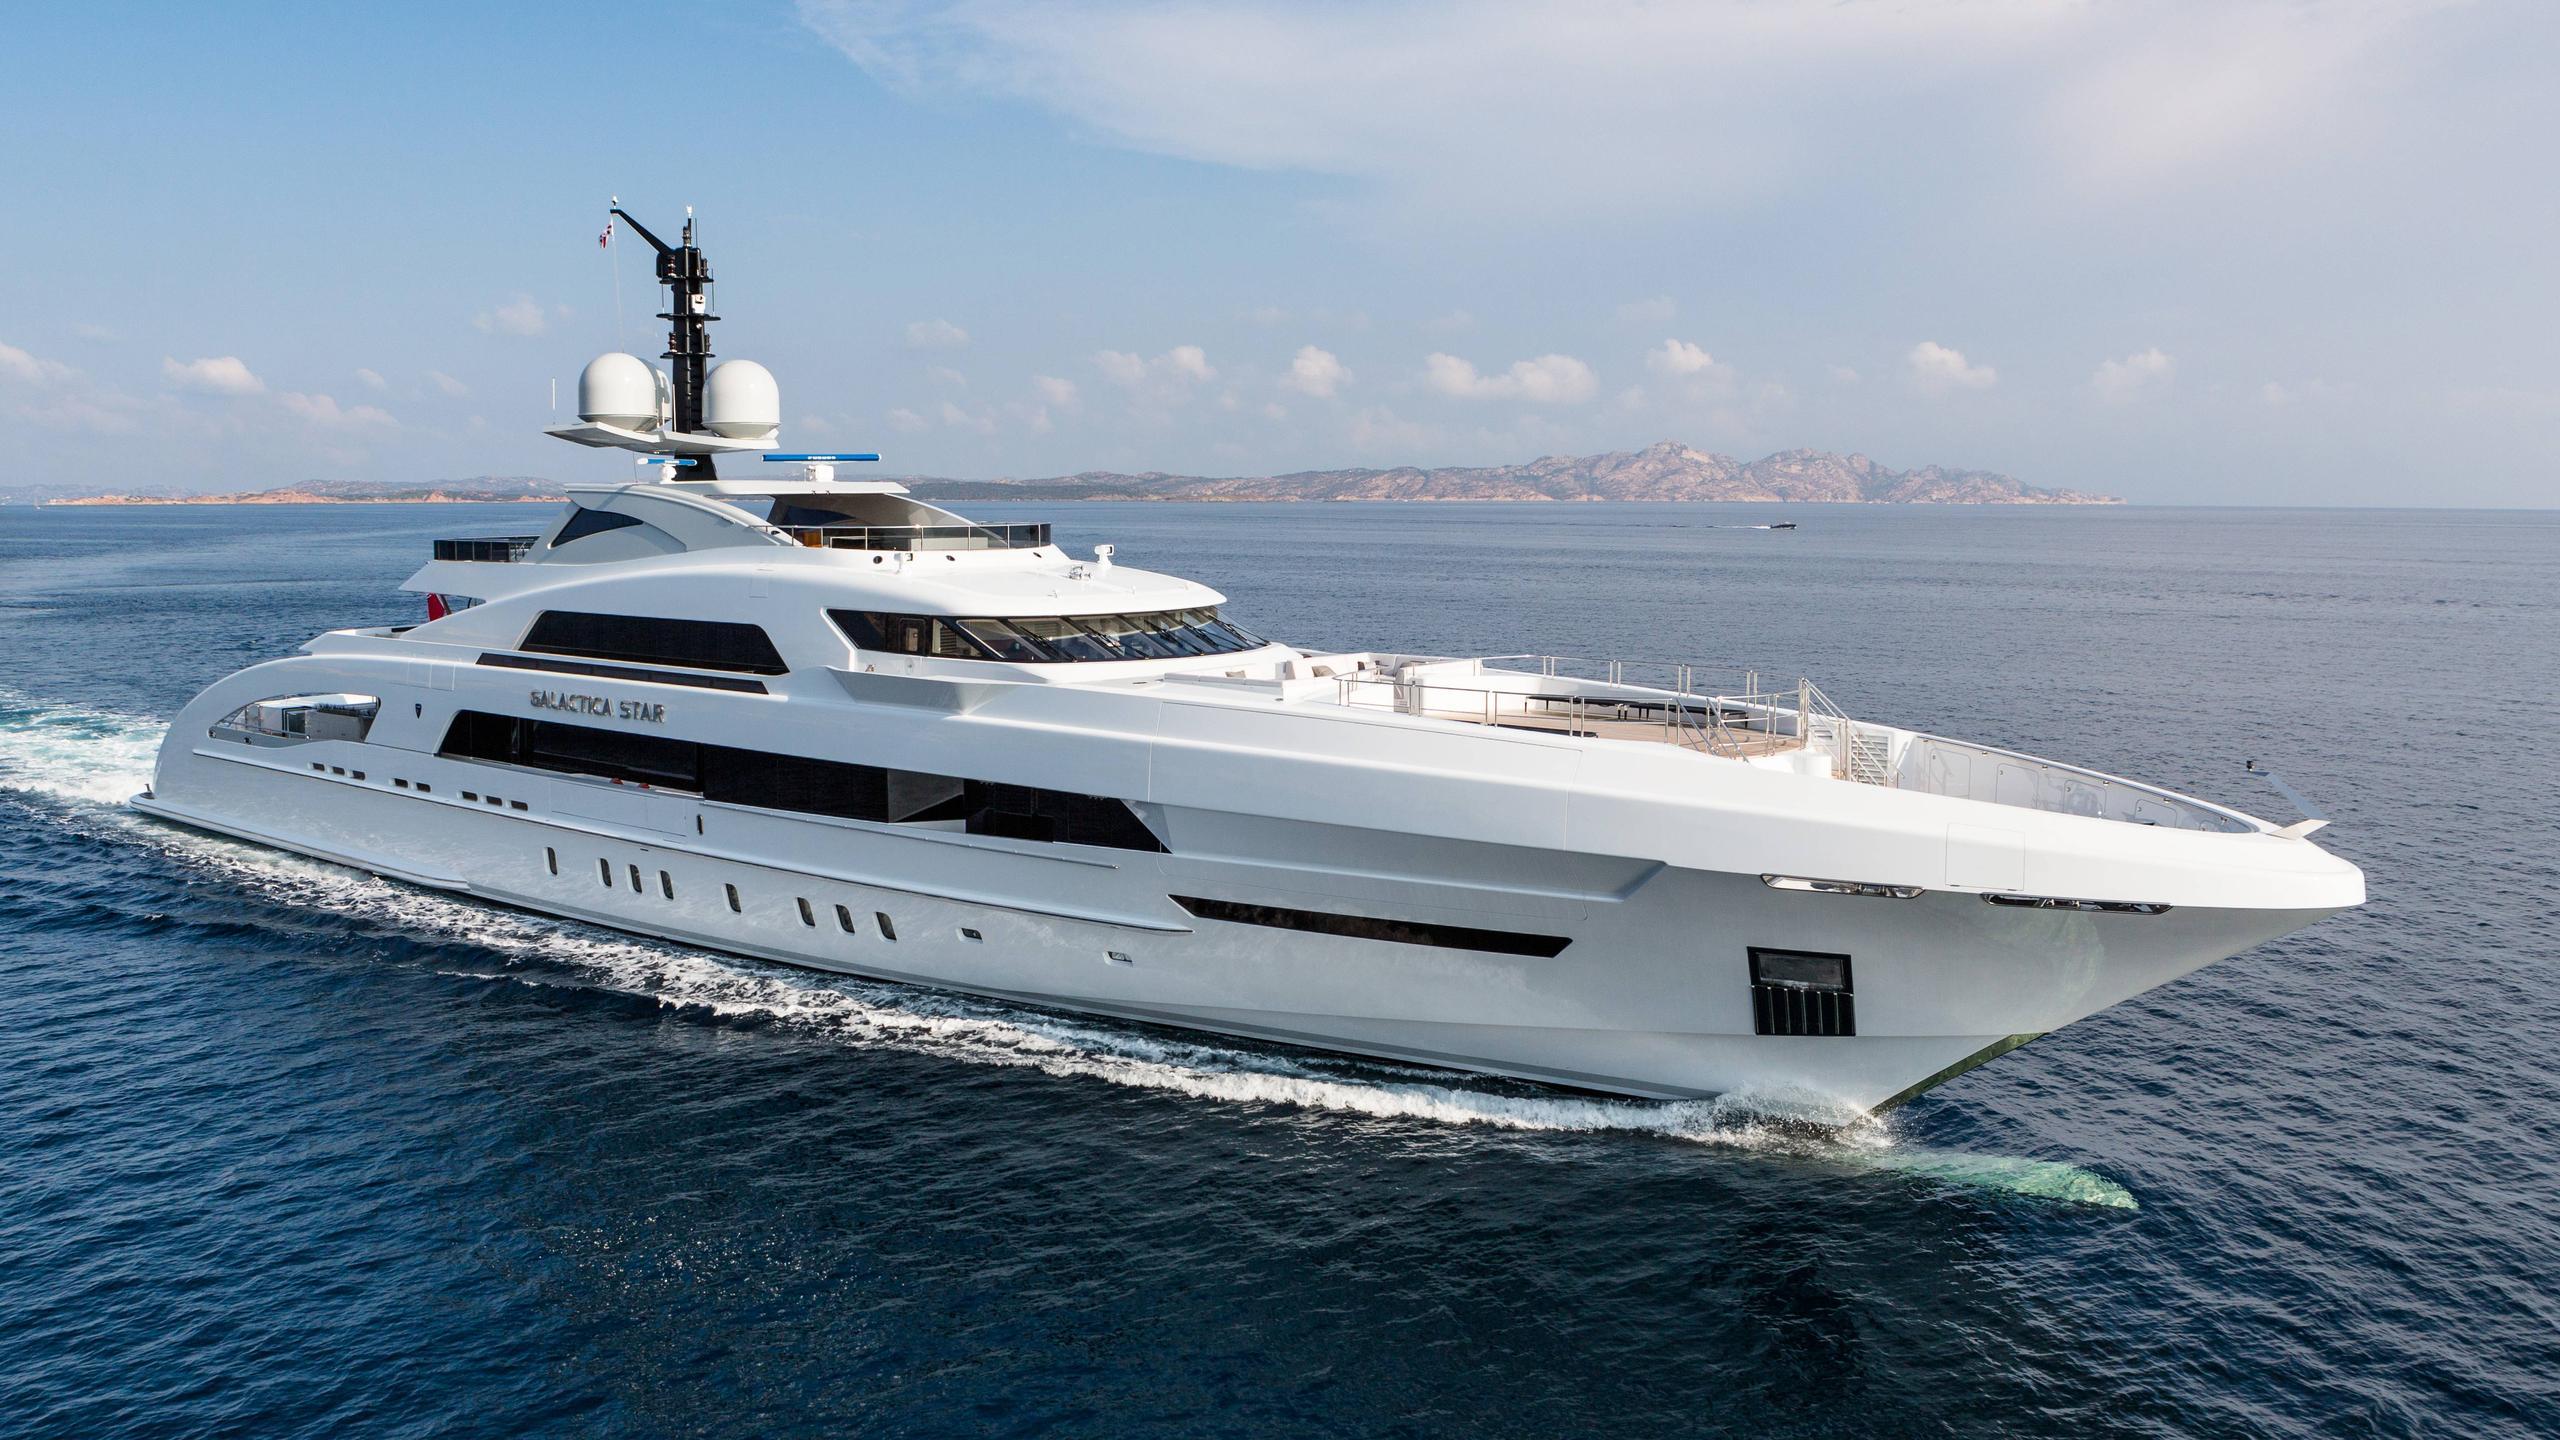 Galactica-Star-motor-yacht-heesen-2013-65m-cruising